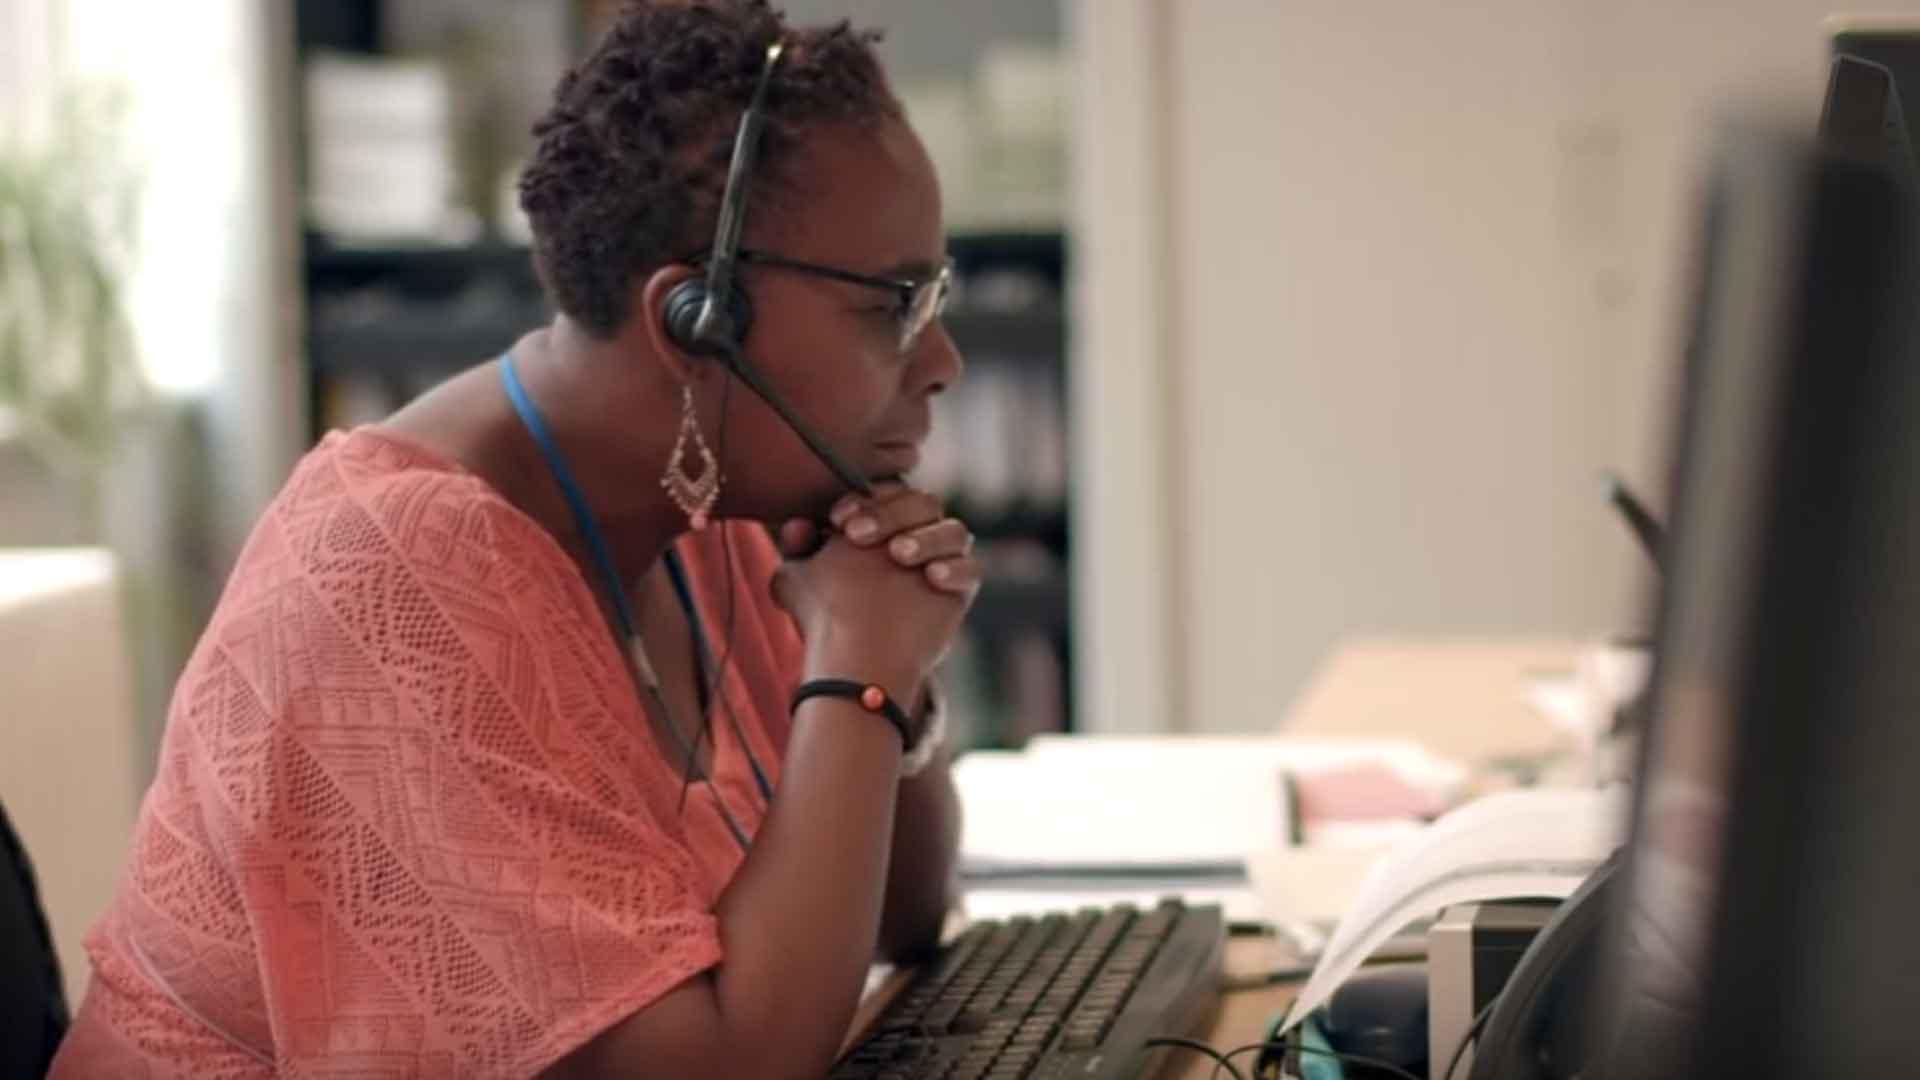 Marcia-helpline-listener